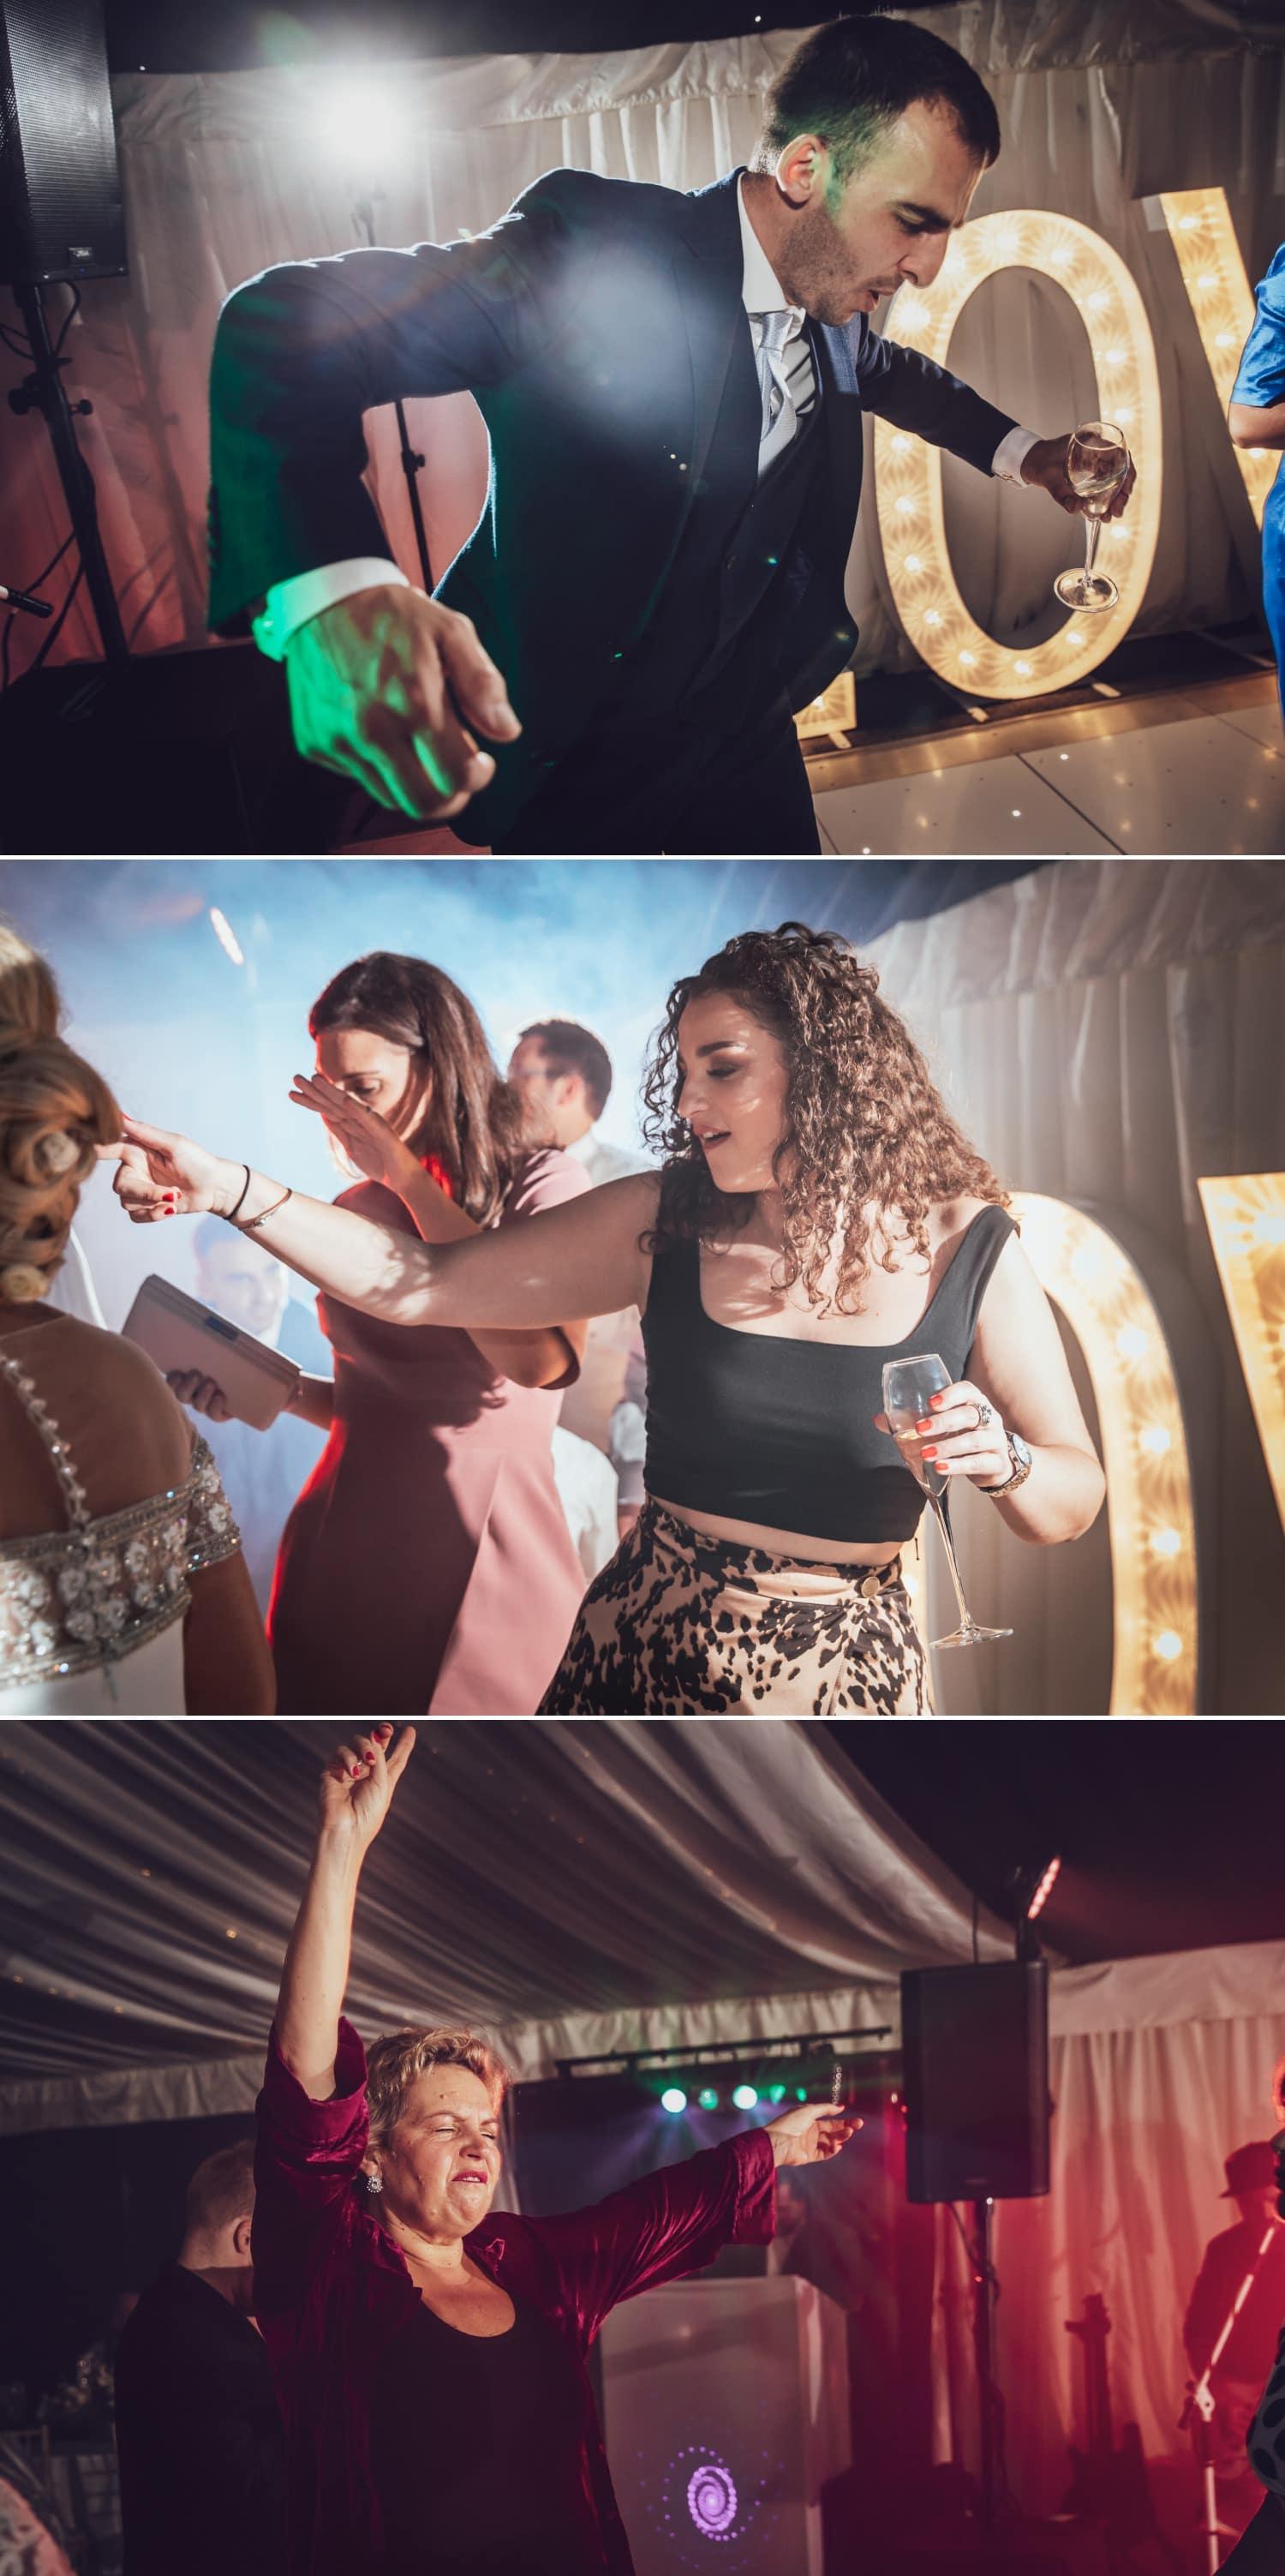 wedding photographs of the dancing at soughton hall